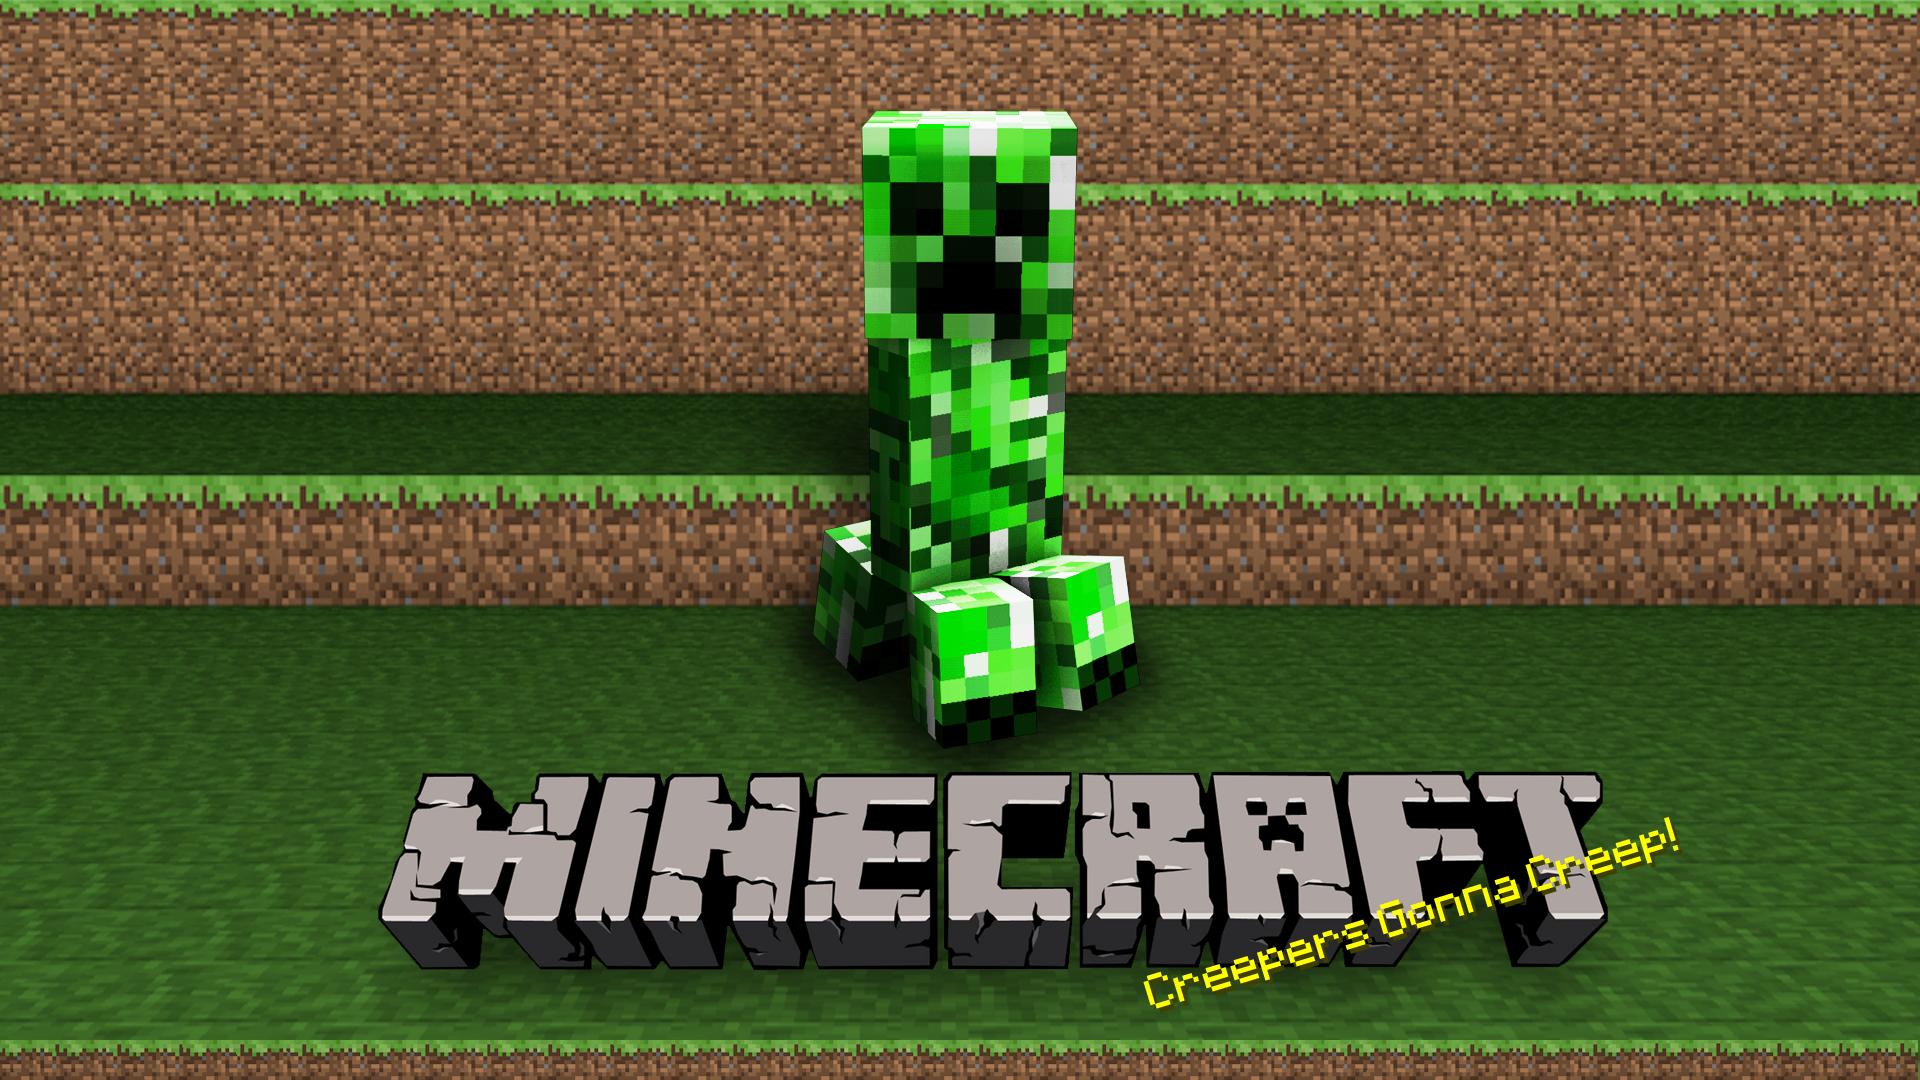 Minecraft 110 Videojuegos: Minecraft Full HD Fondo De Pantalla And Fondo De